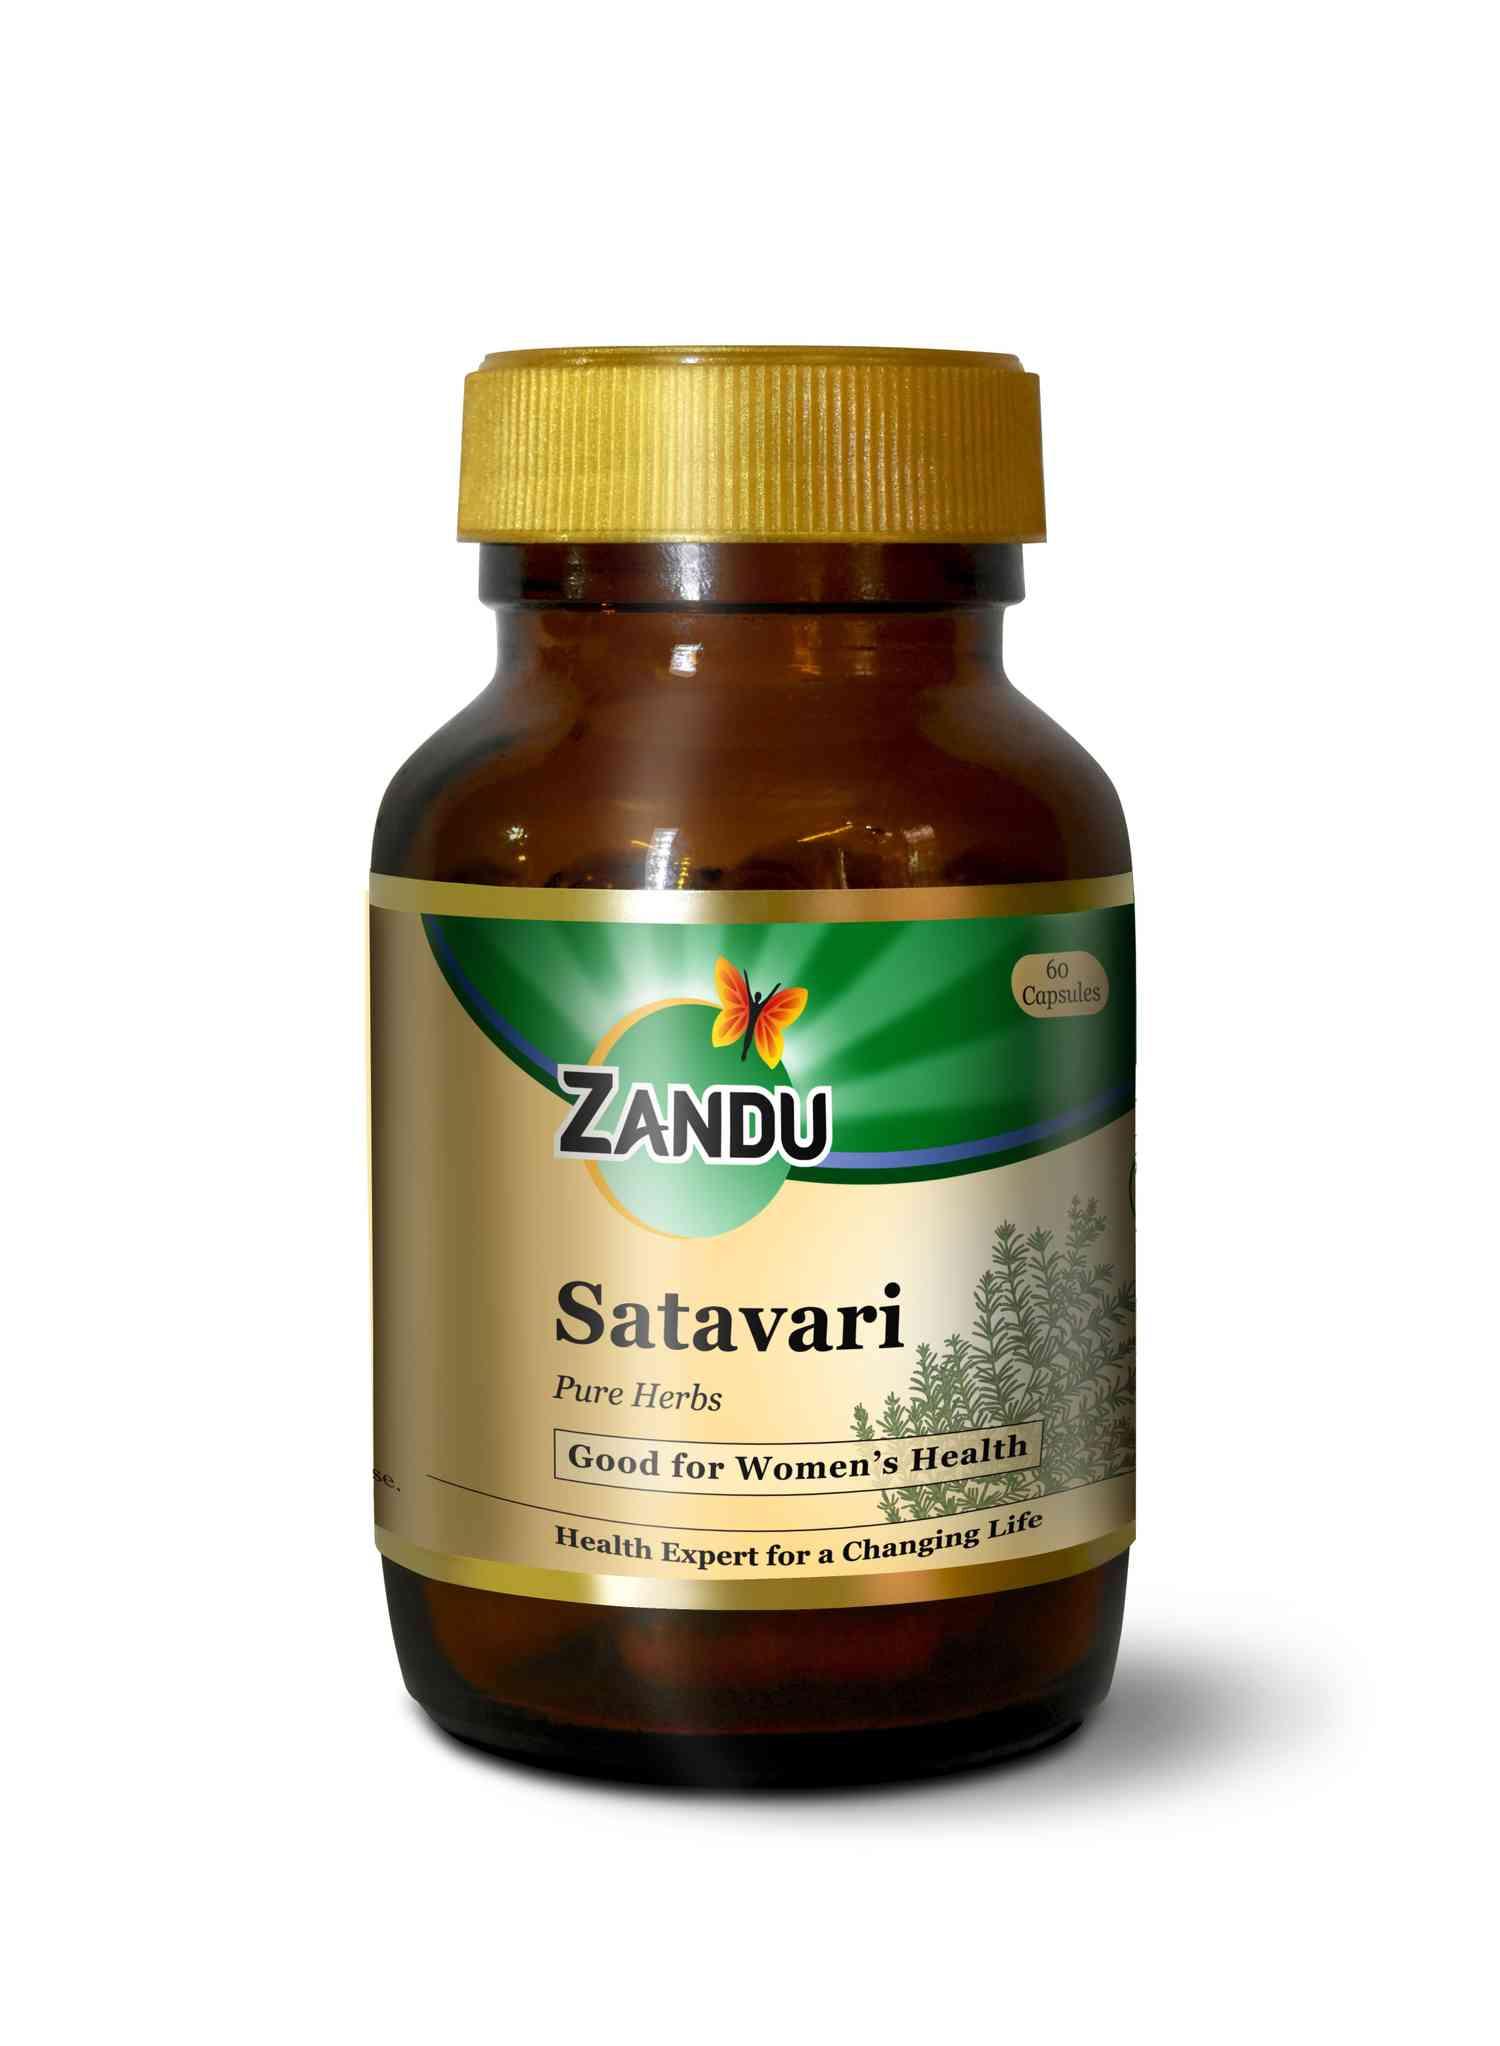 Zandu Shatavari Pure Herbs  Lactation Capsules  Bottle Of 60